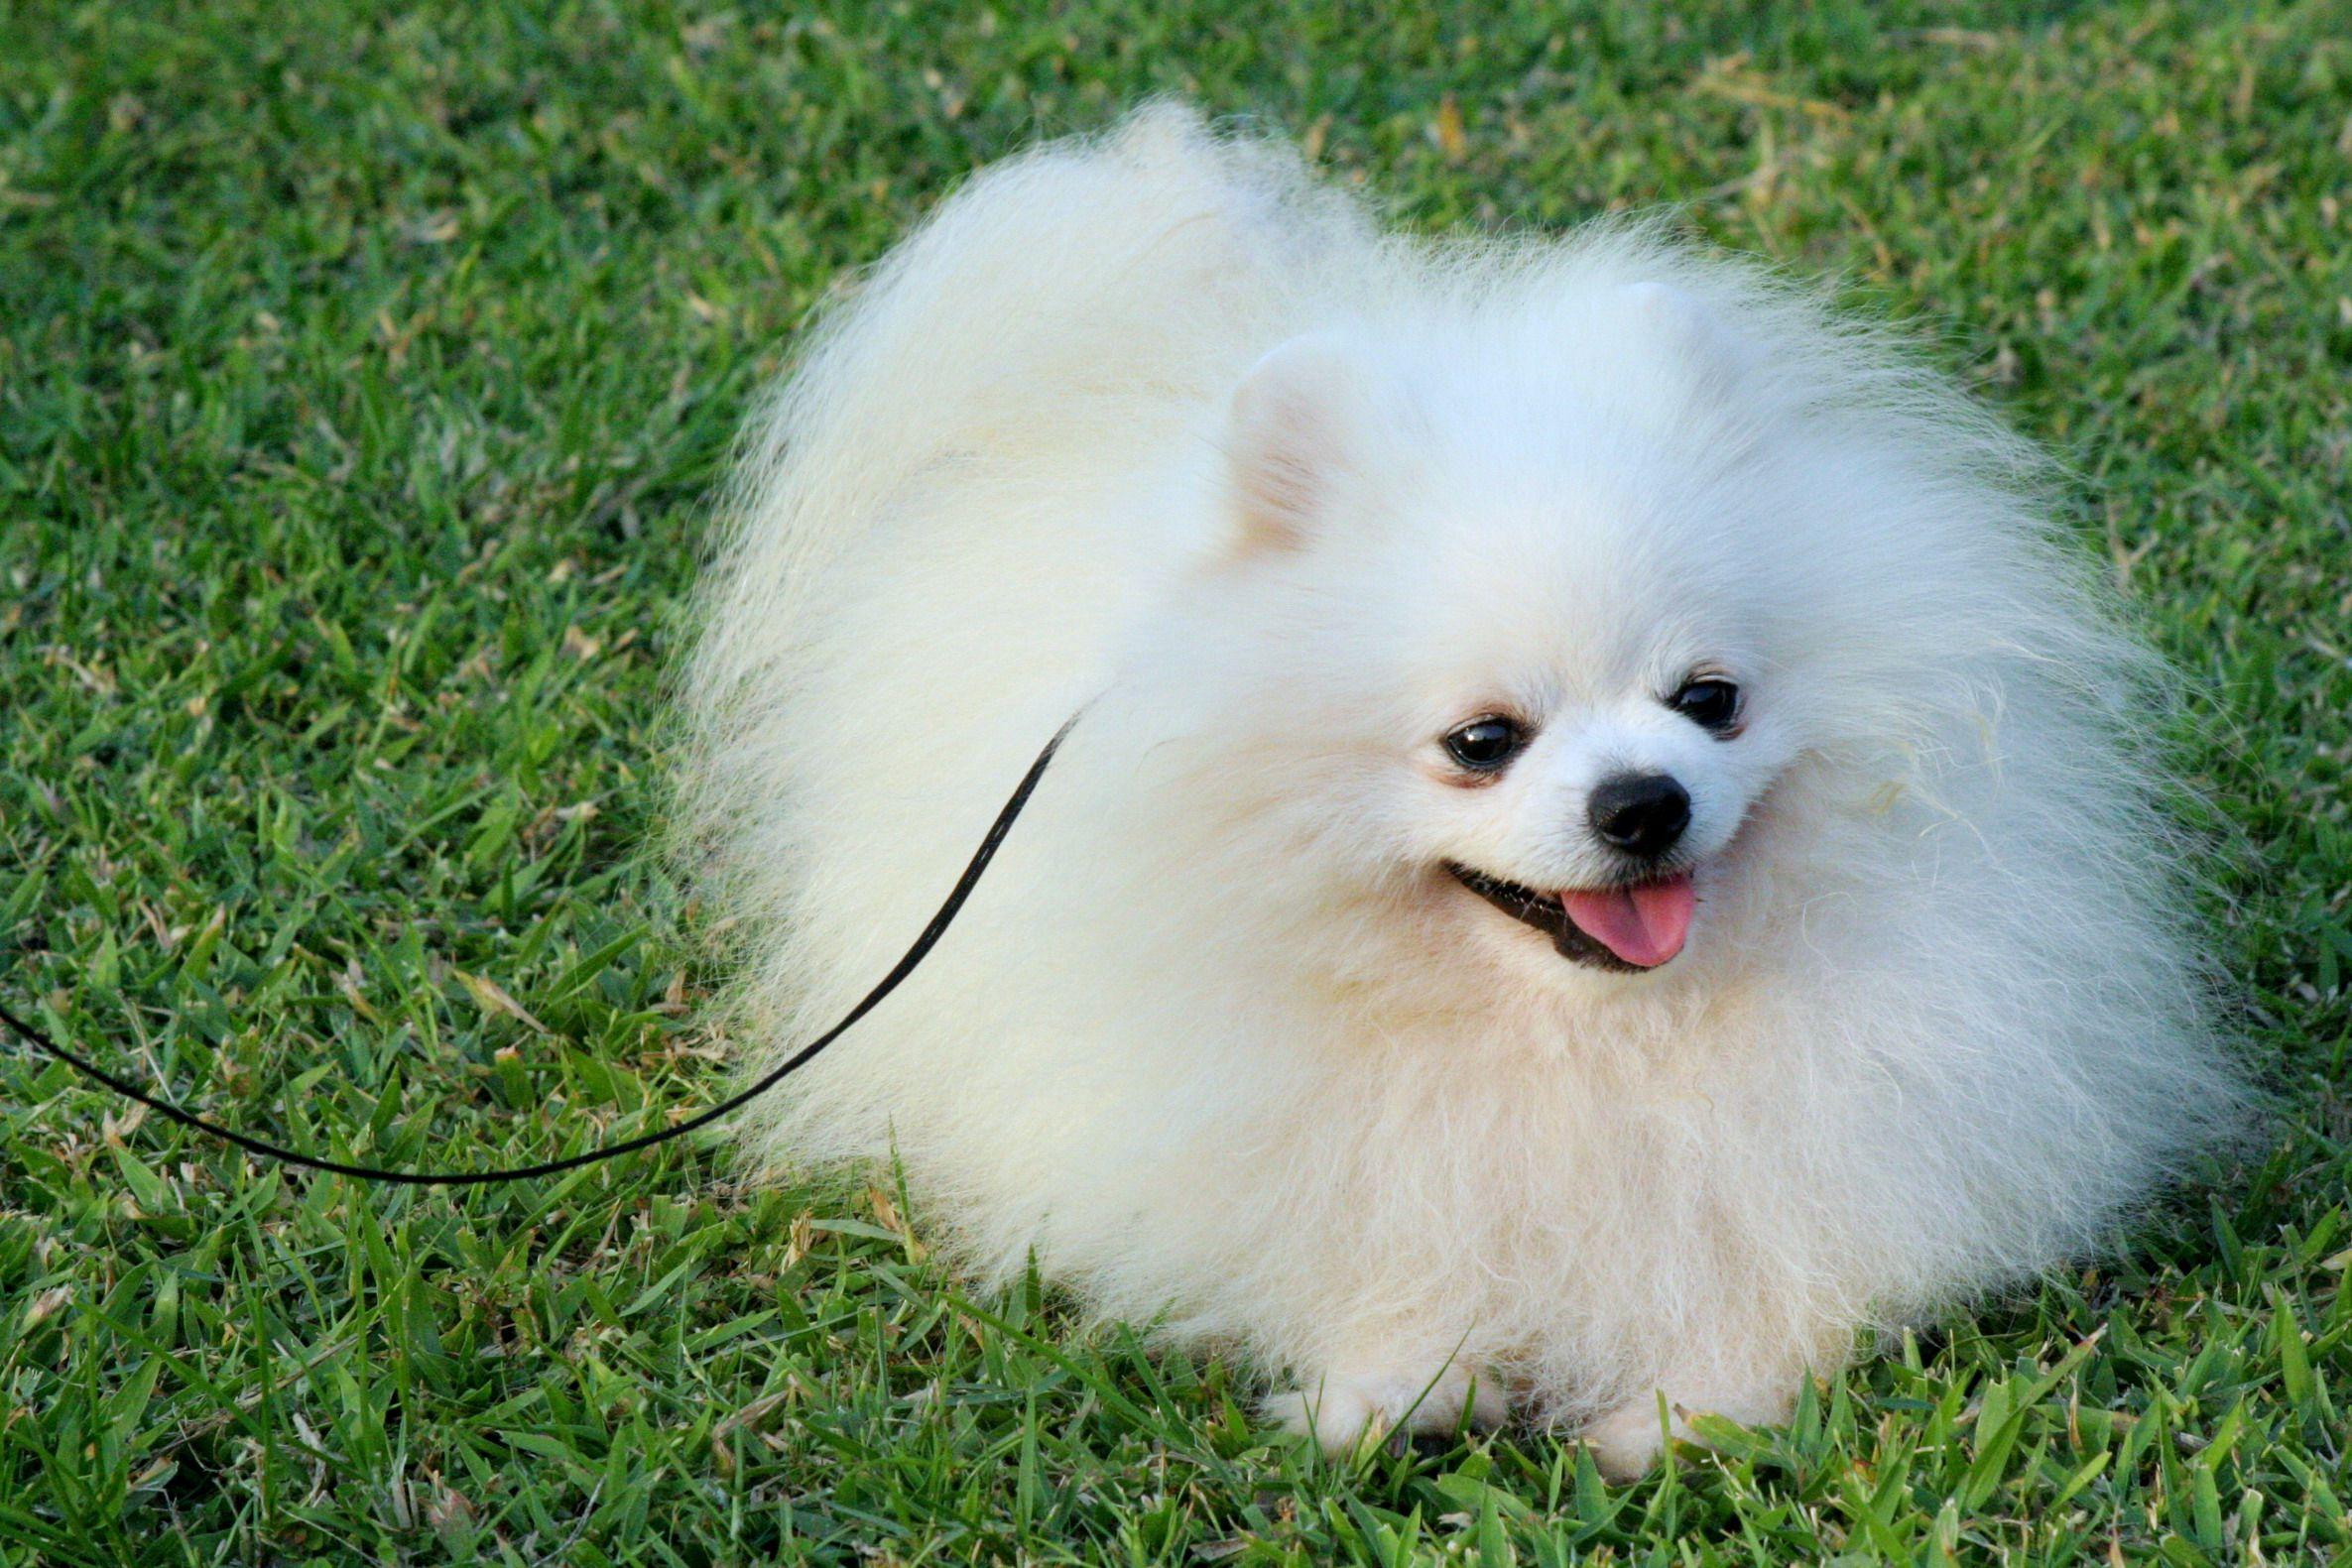 pomeranian puppies White Pomeranian. Male, age of 2